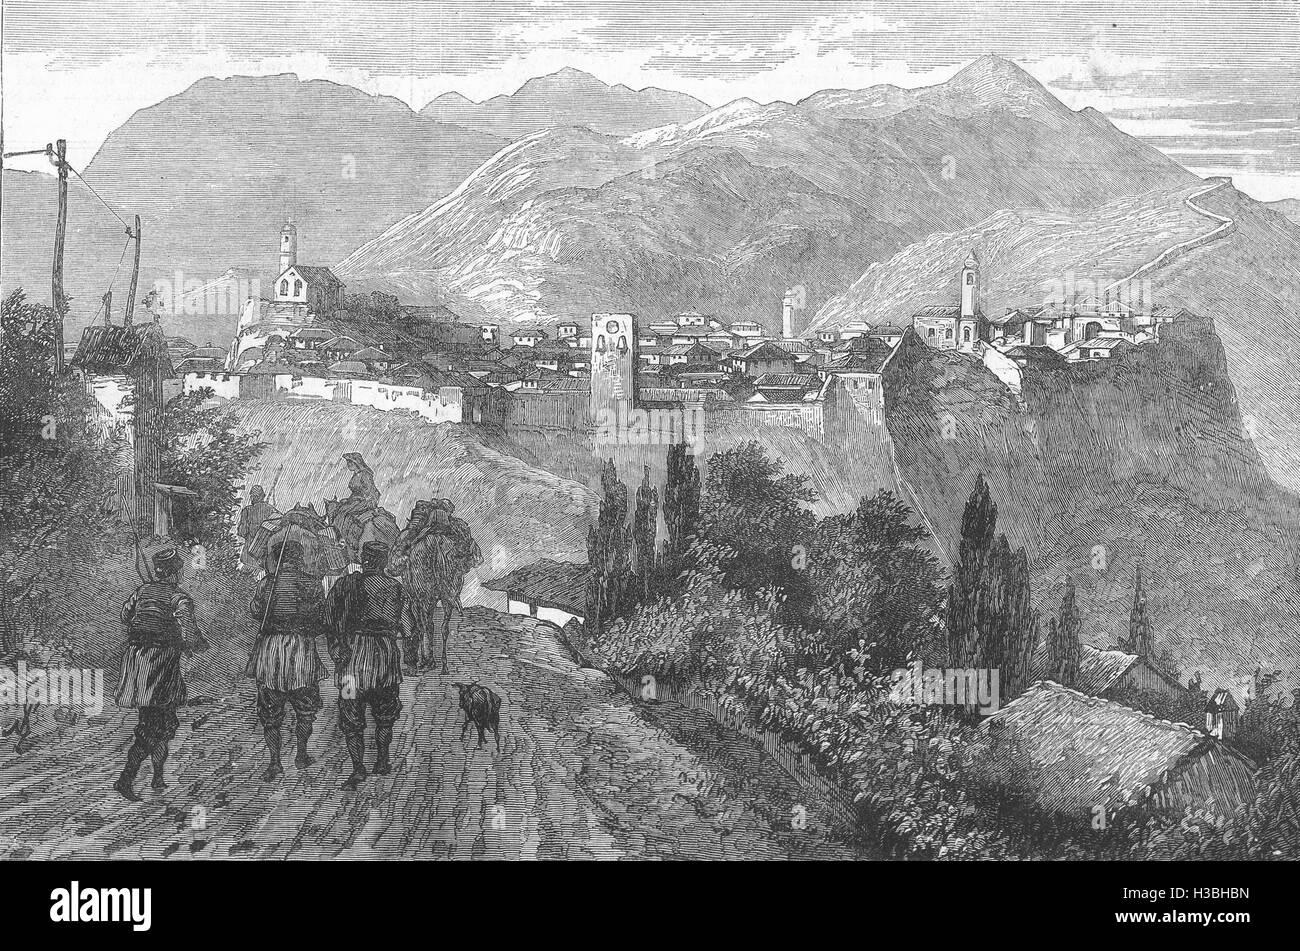 MONTENEGRO Bar, on the Adriatic coast, near Dulcigno 1880. The Illustrated London News - Stock Image